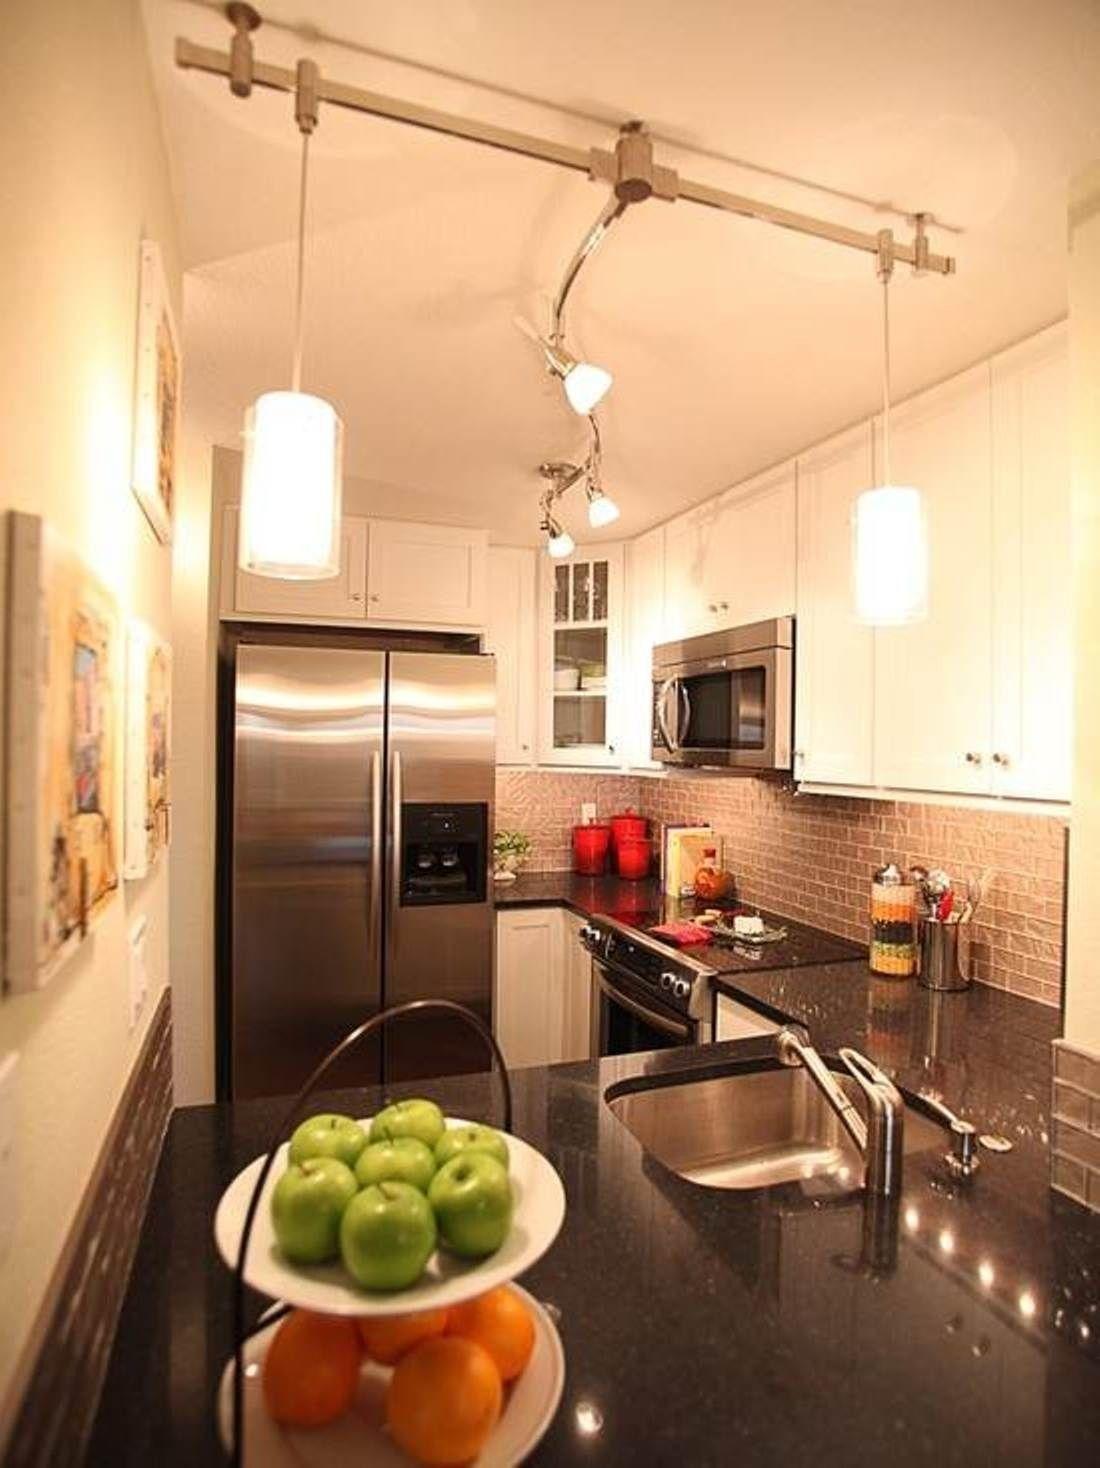 Stylish Pendant Track Lighting Fixtures Track Lighting Kitchen Track Lighting Pendants Cool Kitchens